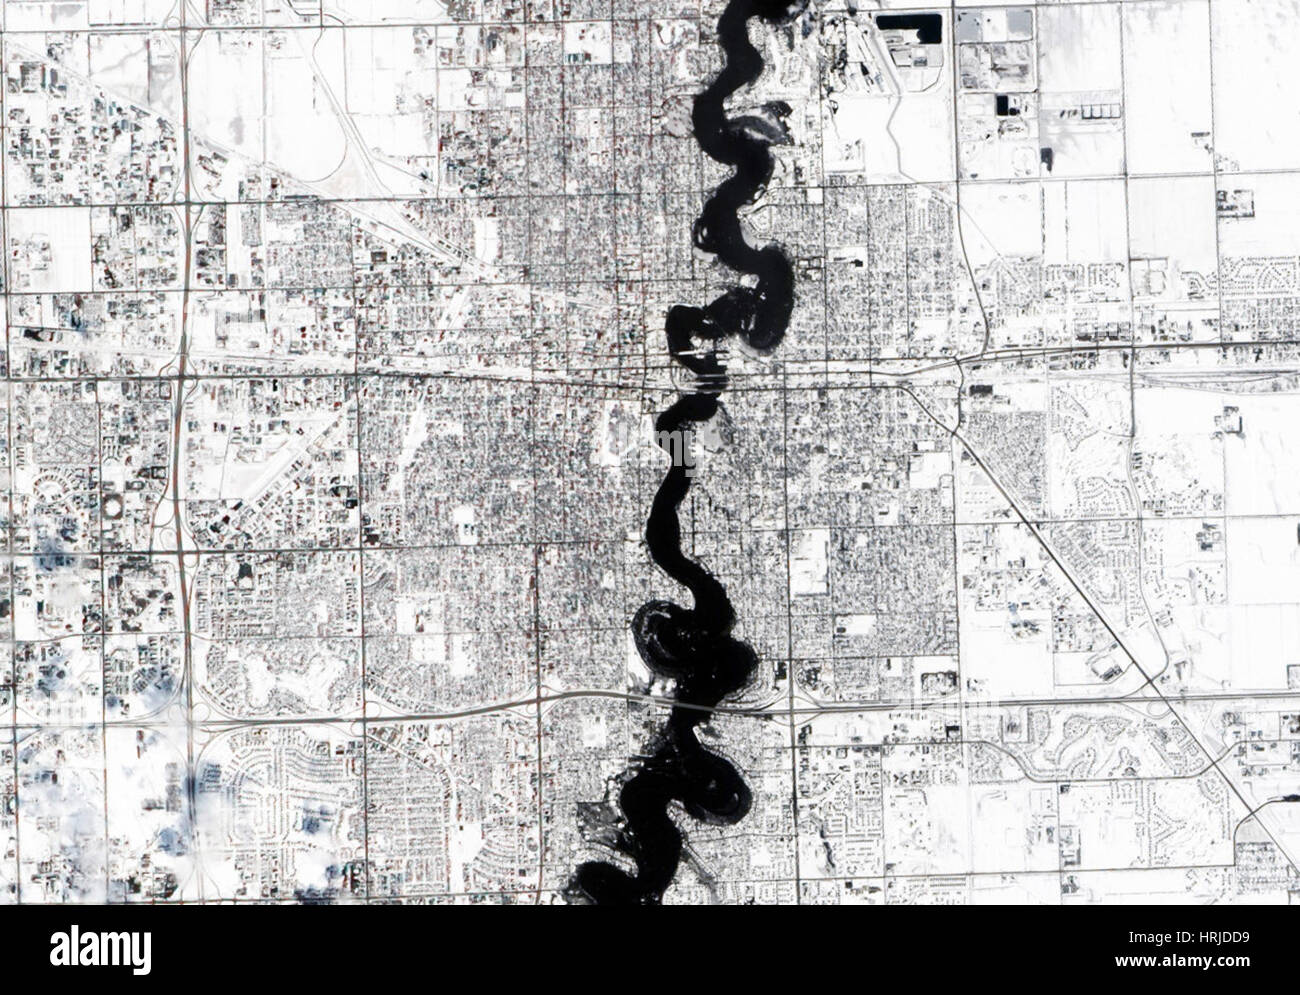 Red River Flood, ALI, 2009 - Stock Image